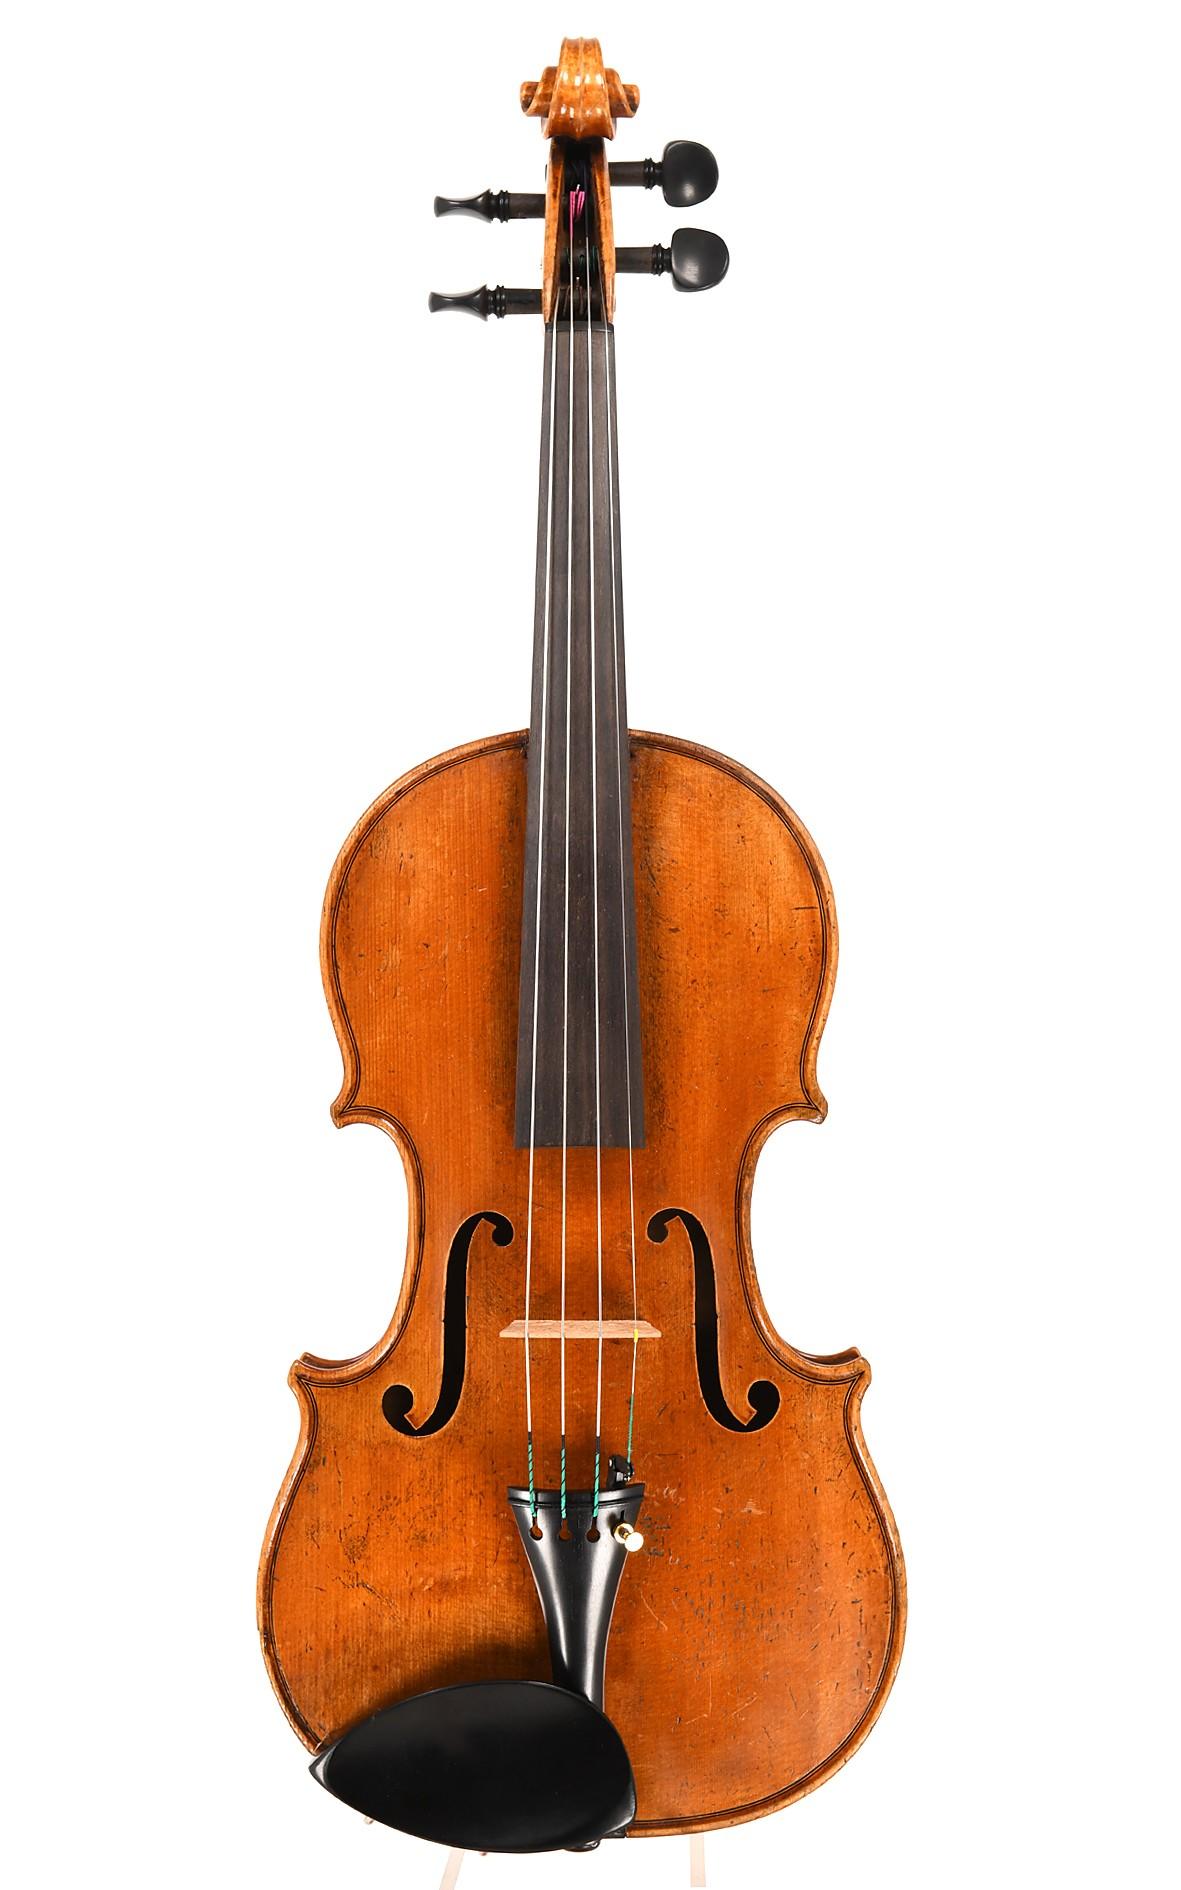 Feine Violine von Joseph Laurent Mast, Toulouse, 1823